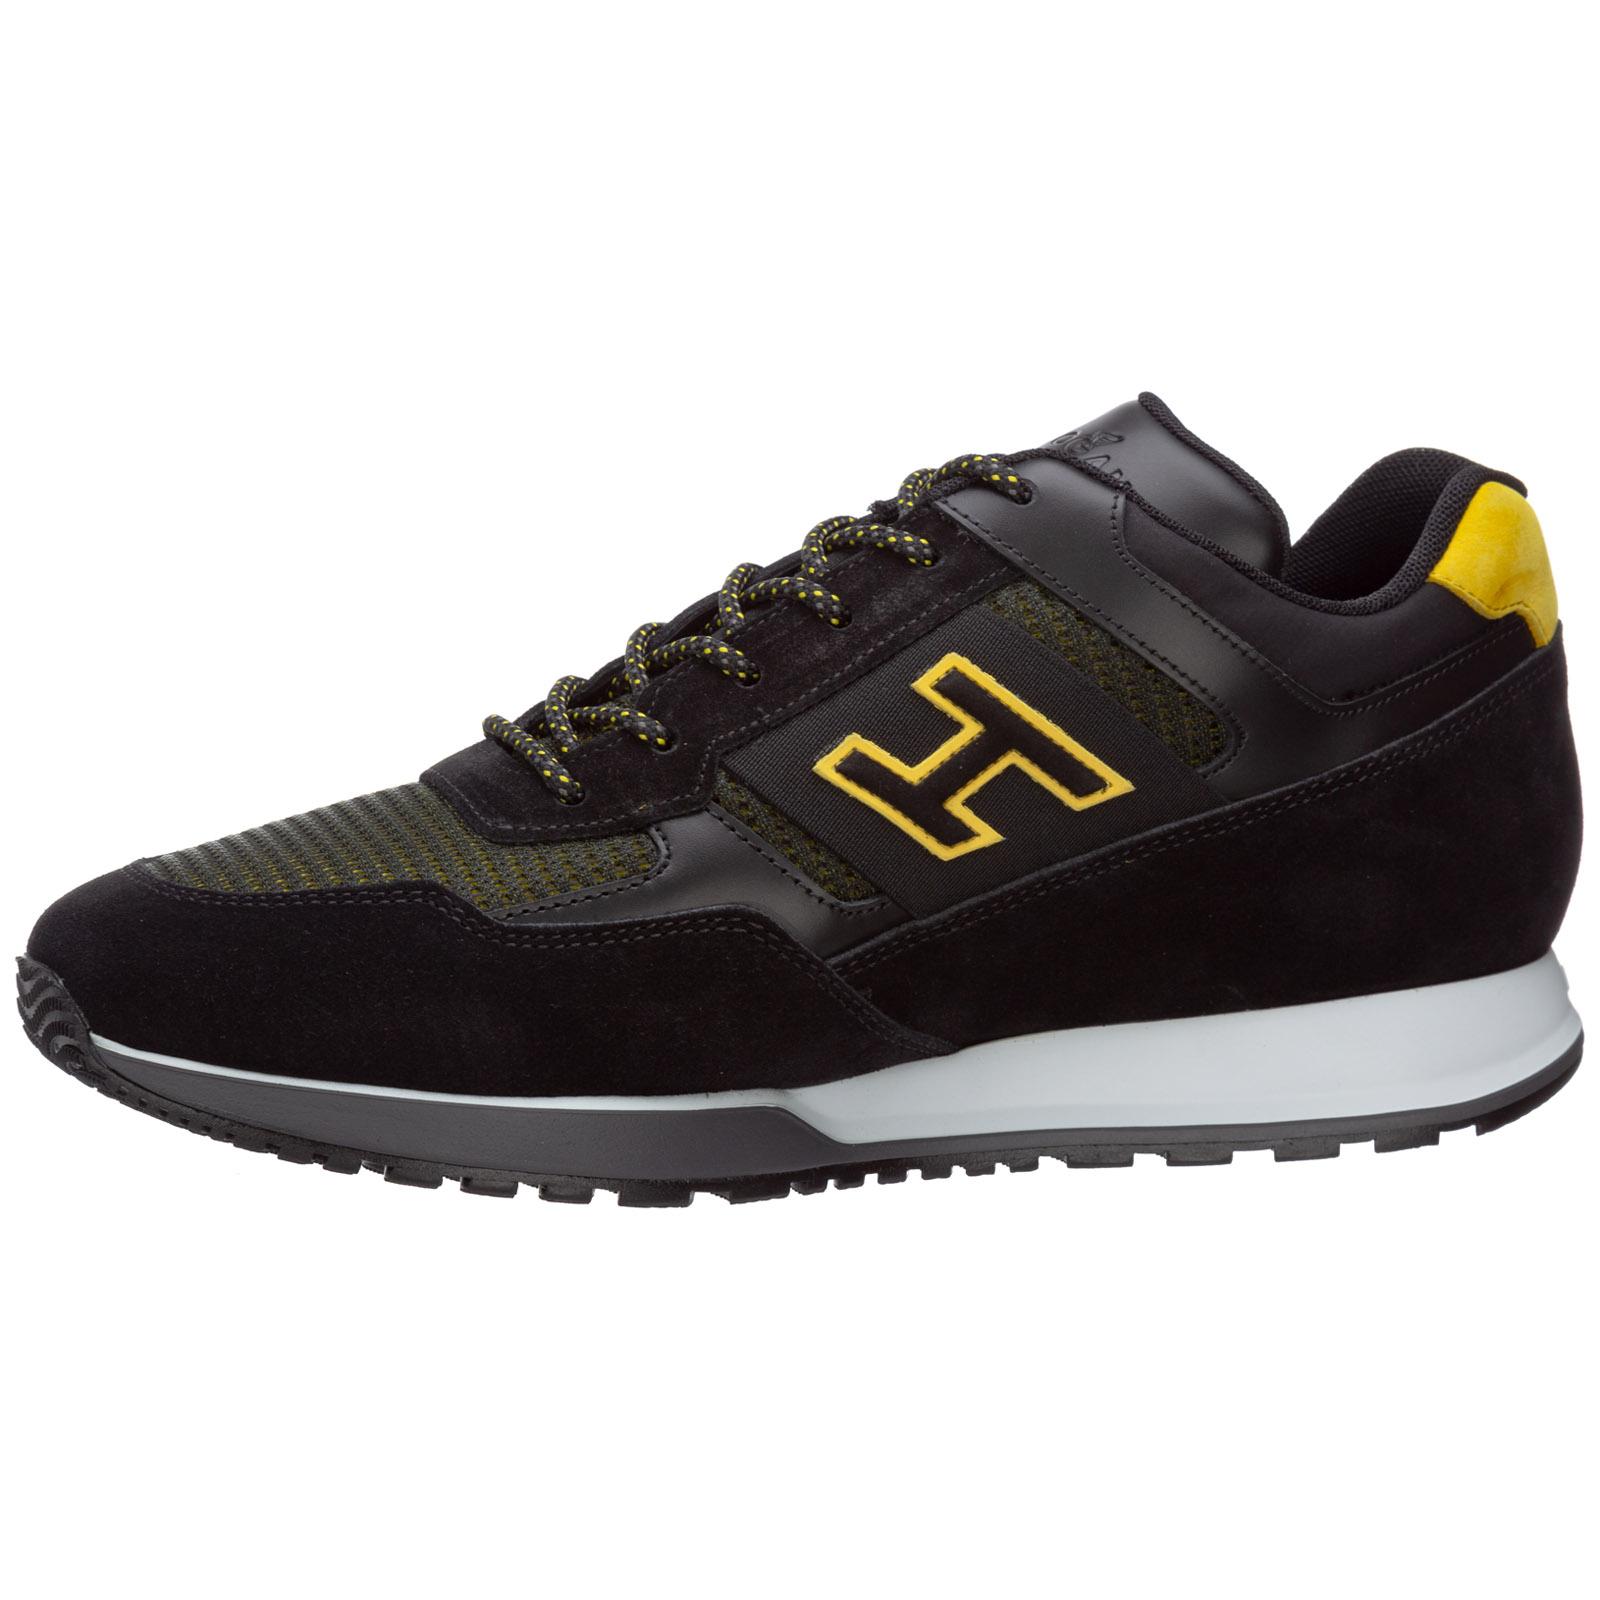 Scarpe sneakers uomo camoscio h321